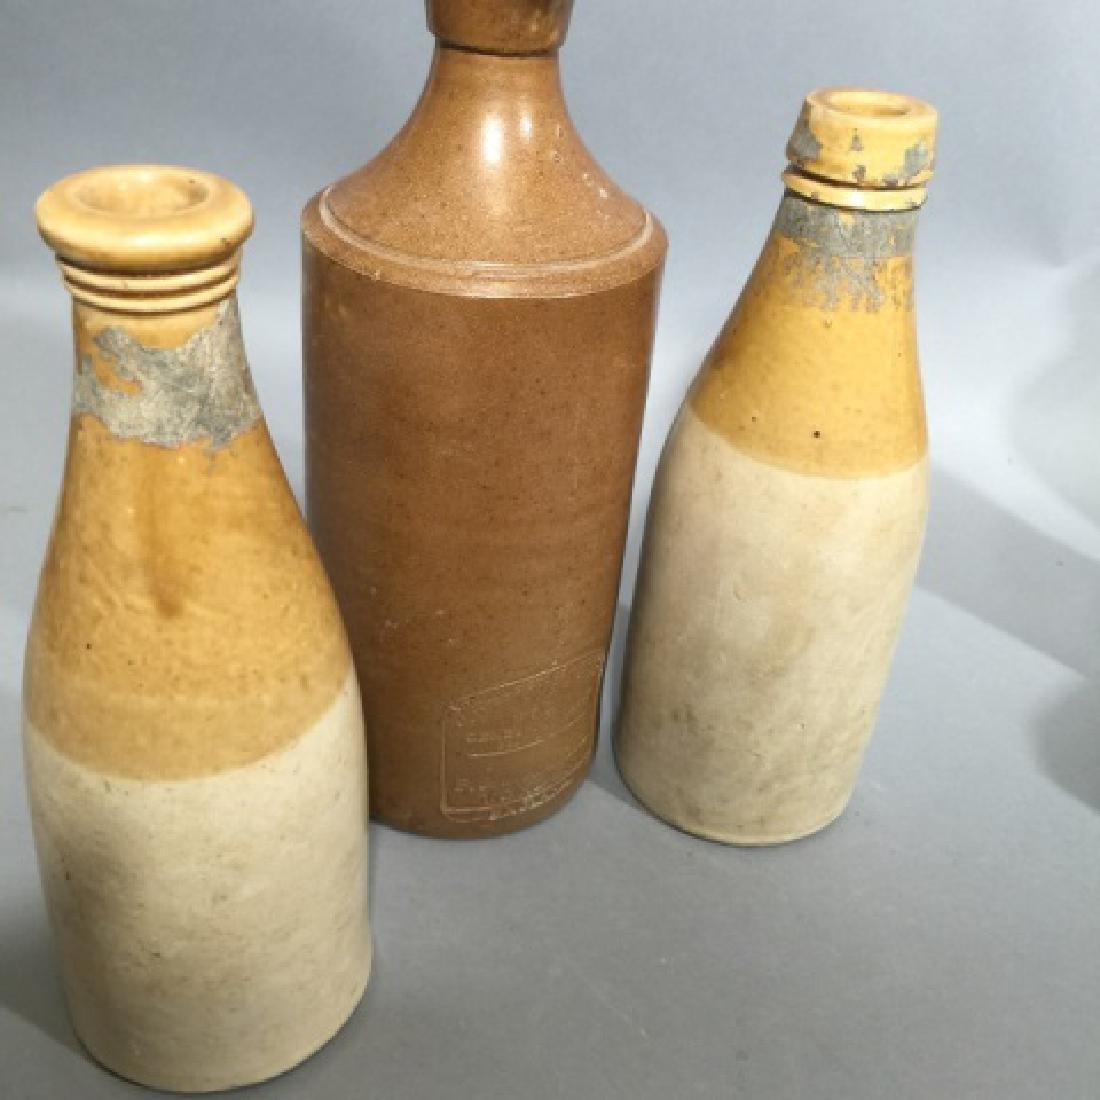 Group of 6 Antique & Vintage Stoneware Bottles - 3